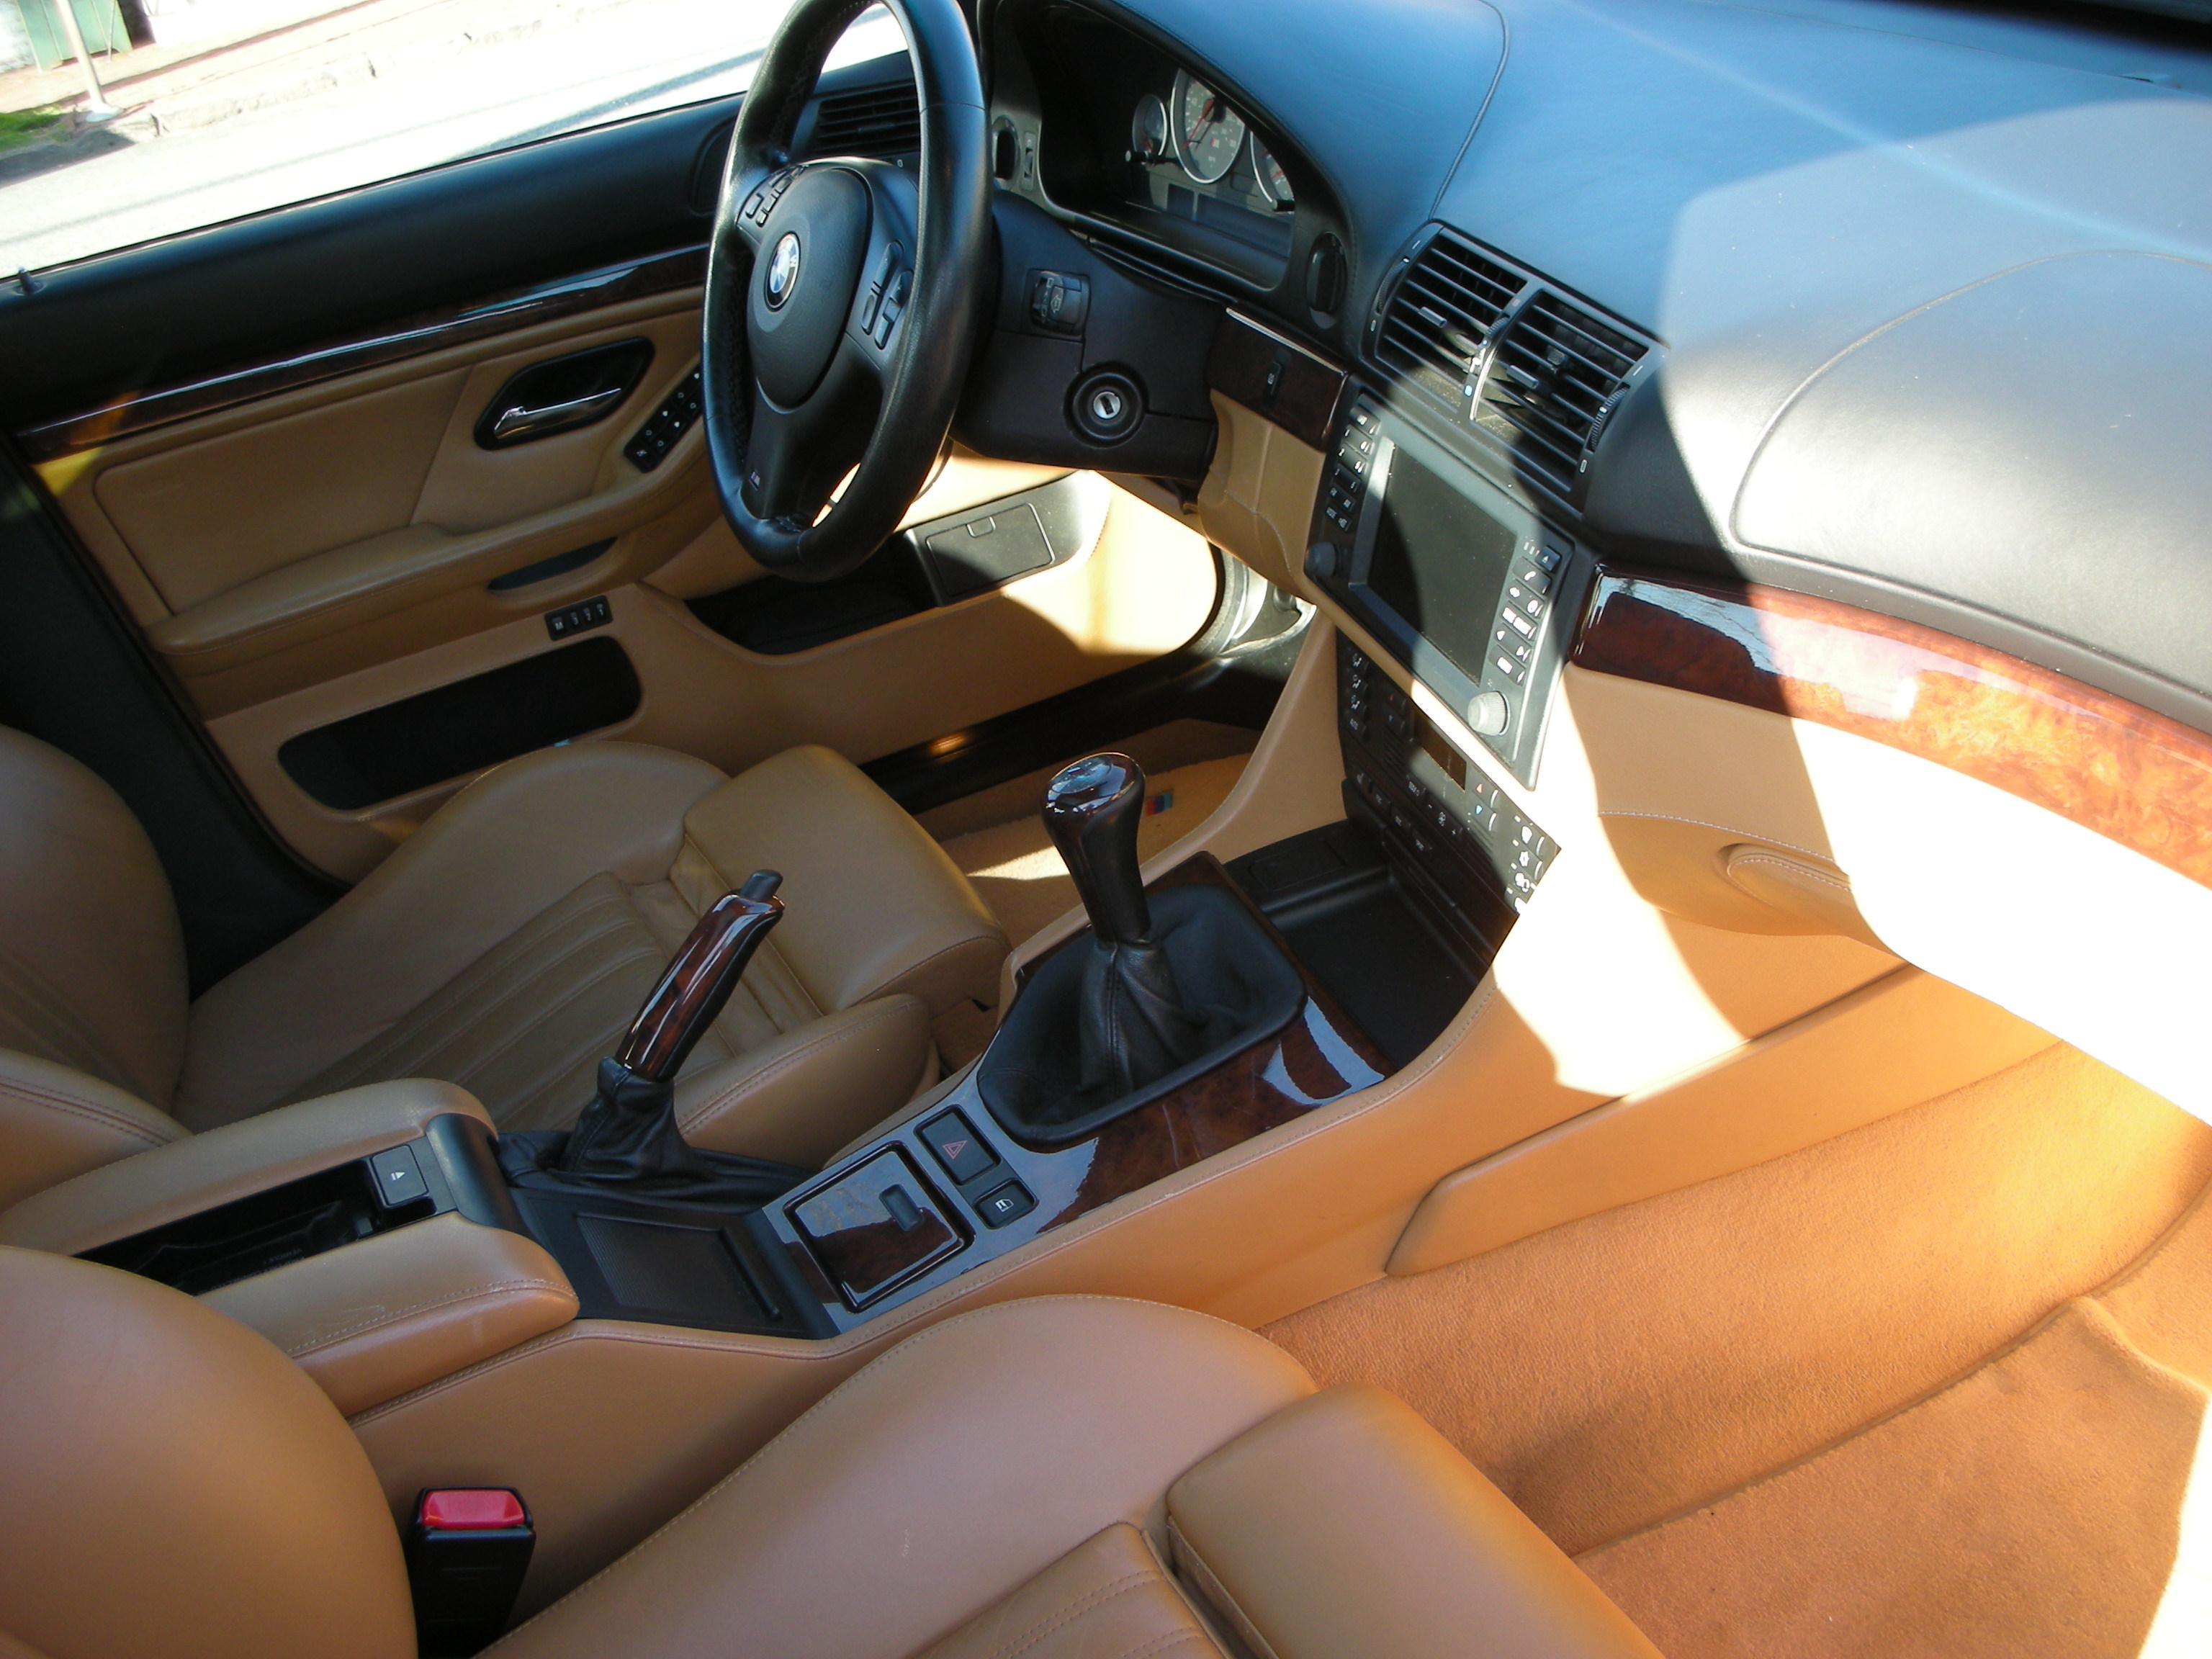 What Enthusiast E39 M5 Ownership Looks Like